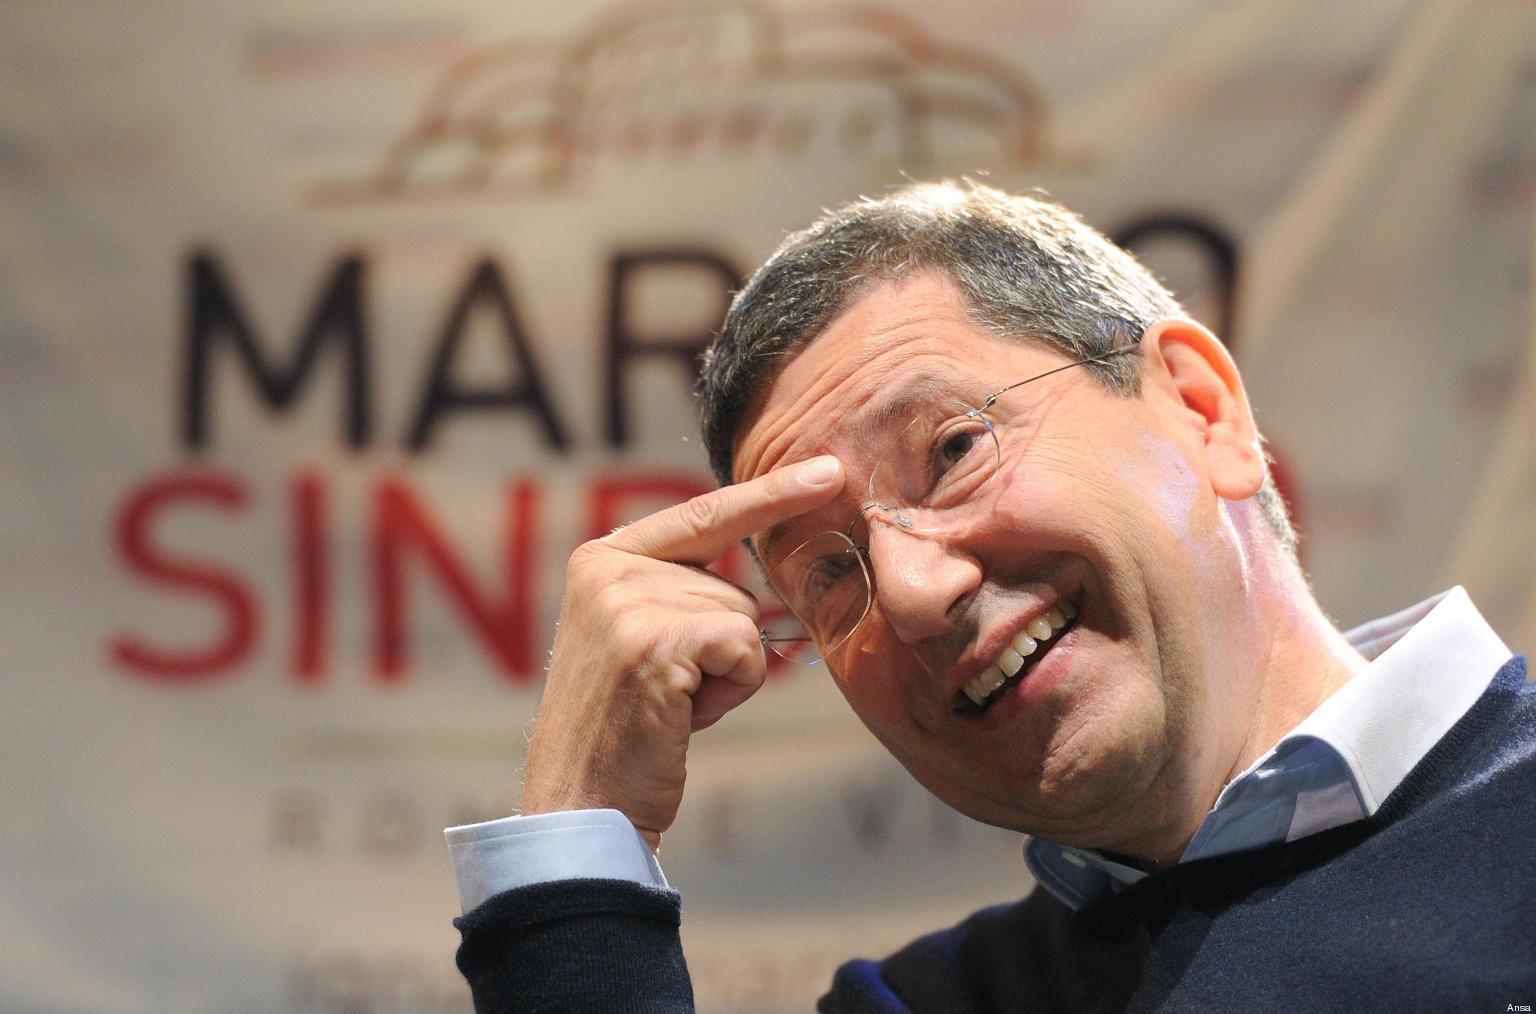 Ignazio Marino (Fonte: huffingtonpost.it)